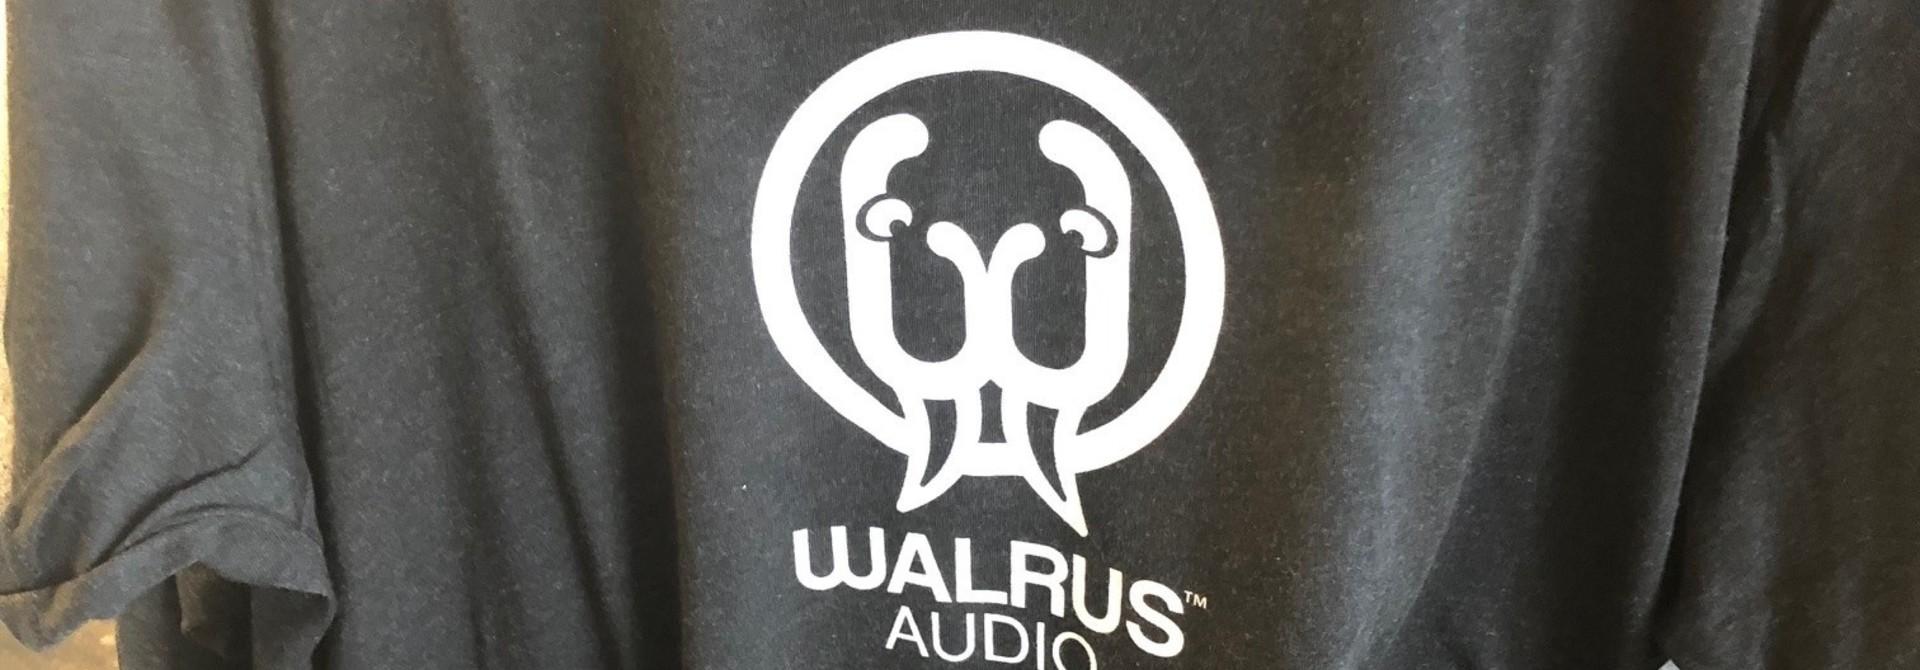 Walrus Small Print Tee